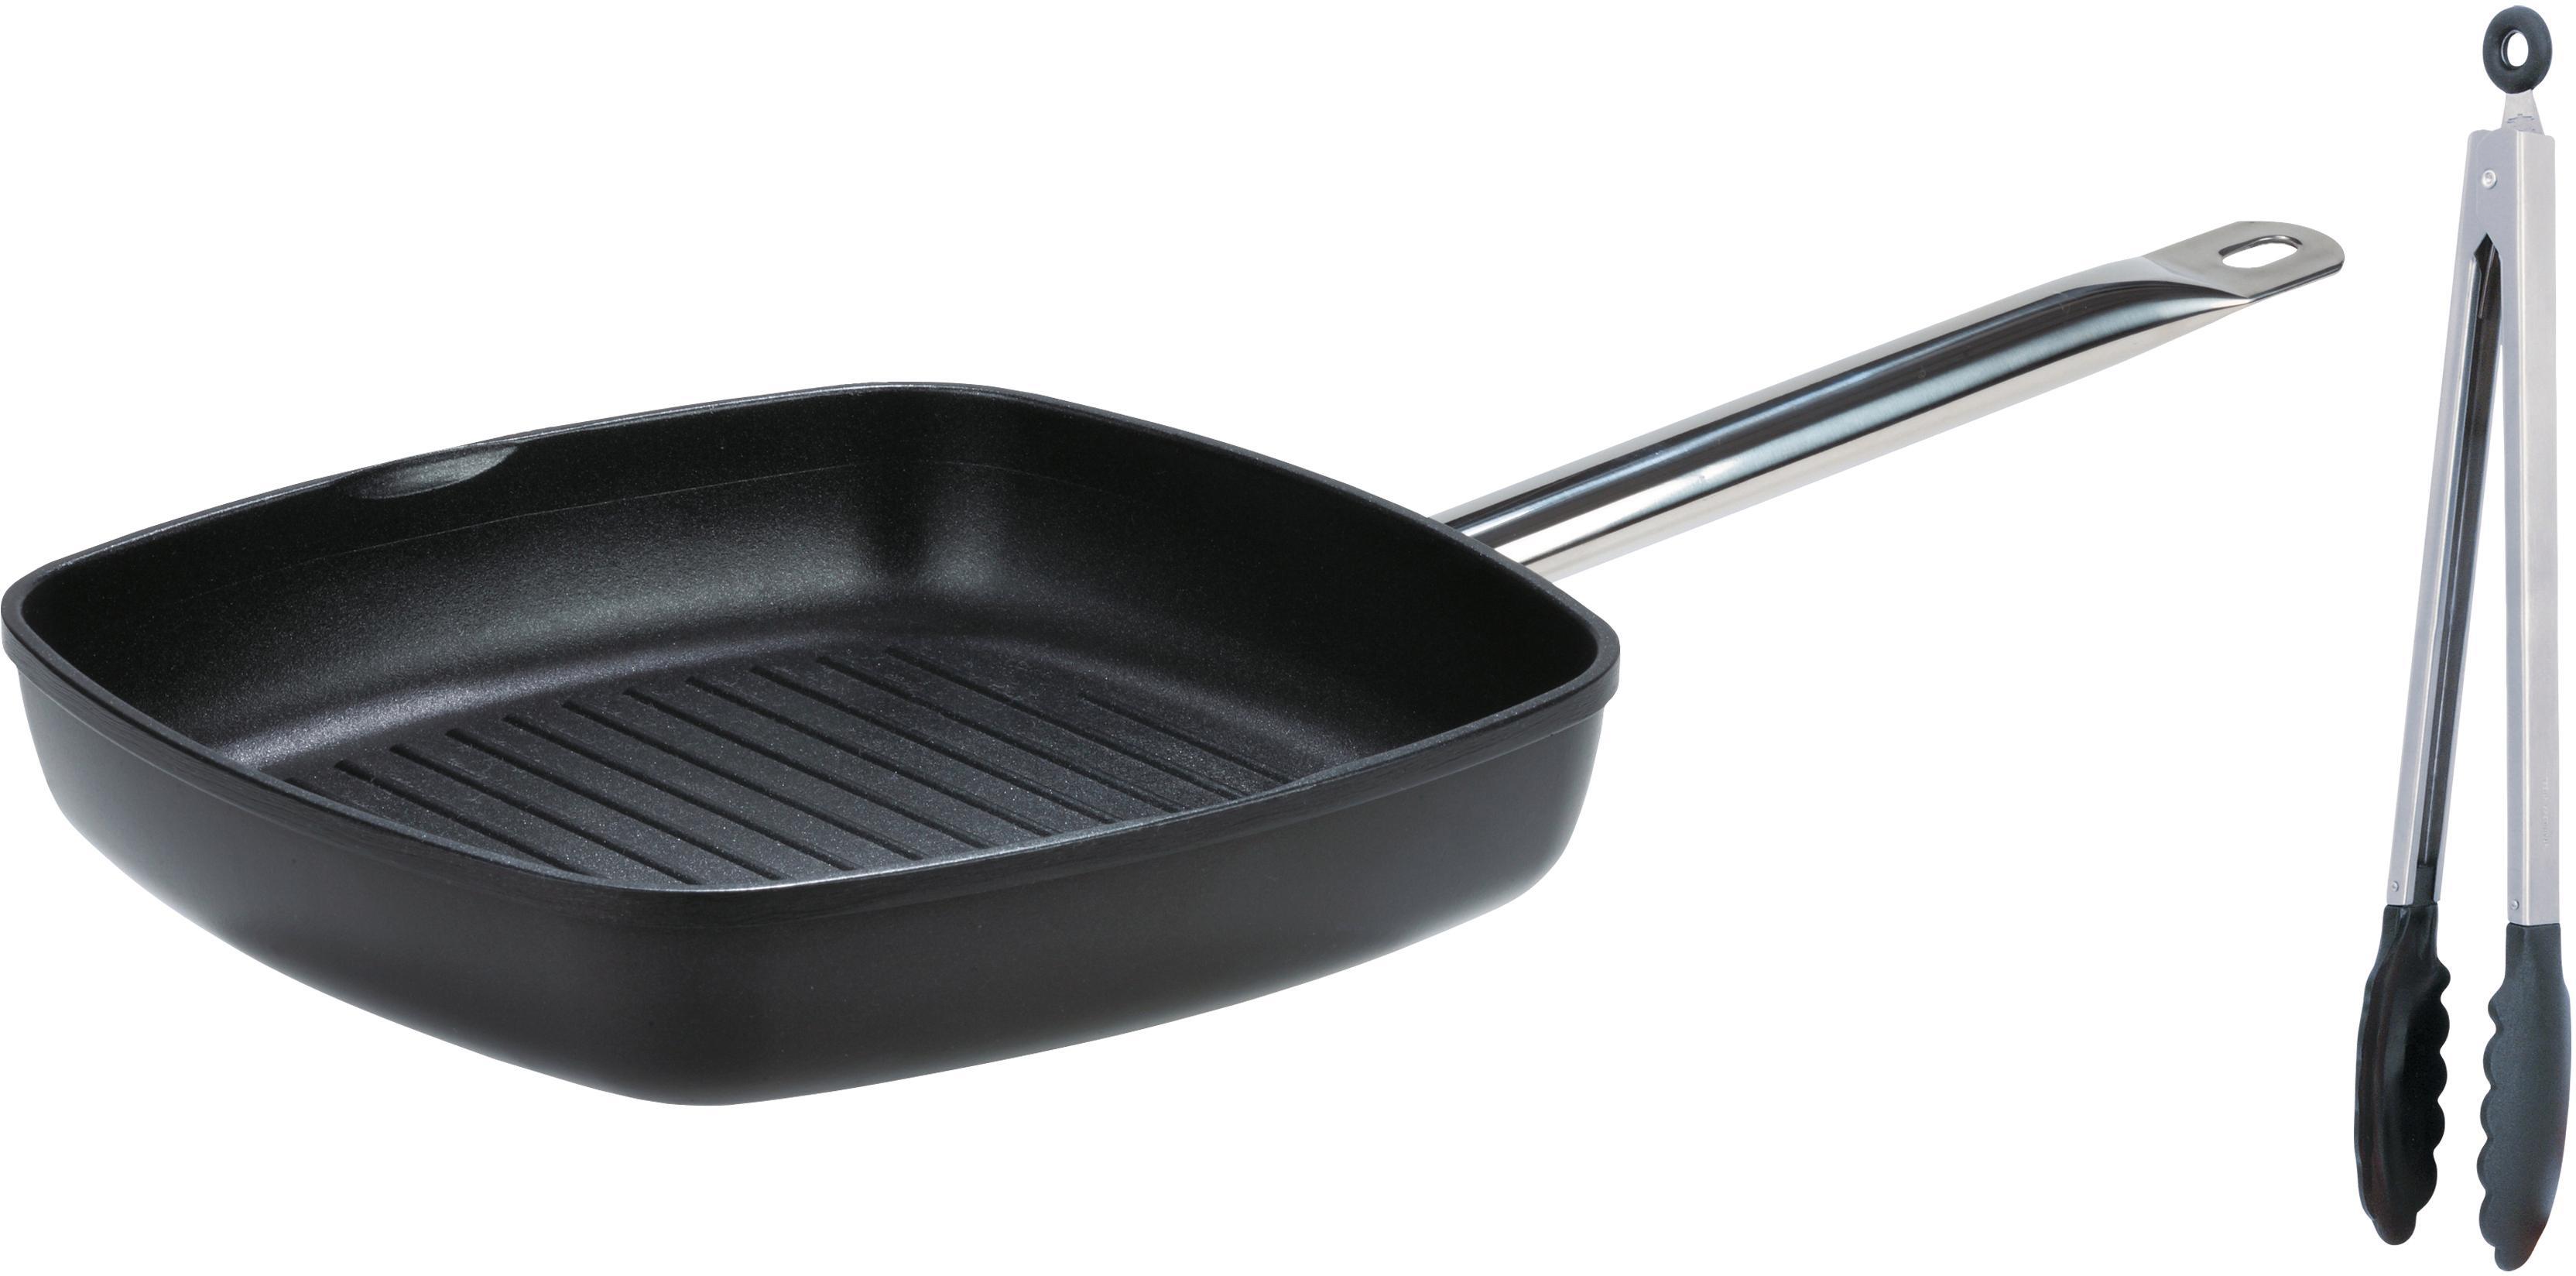 GSW Grillpfanne »Gastro traditionell«